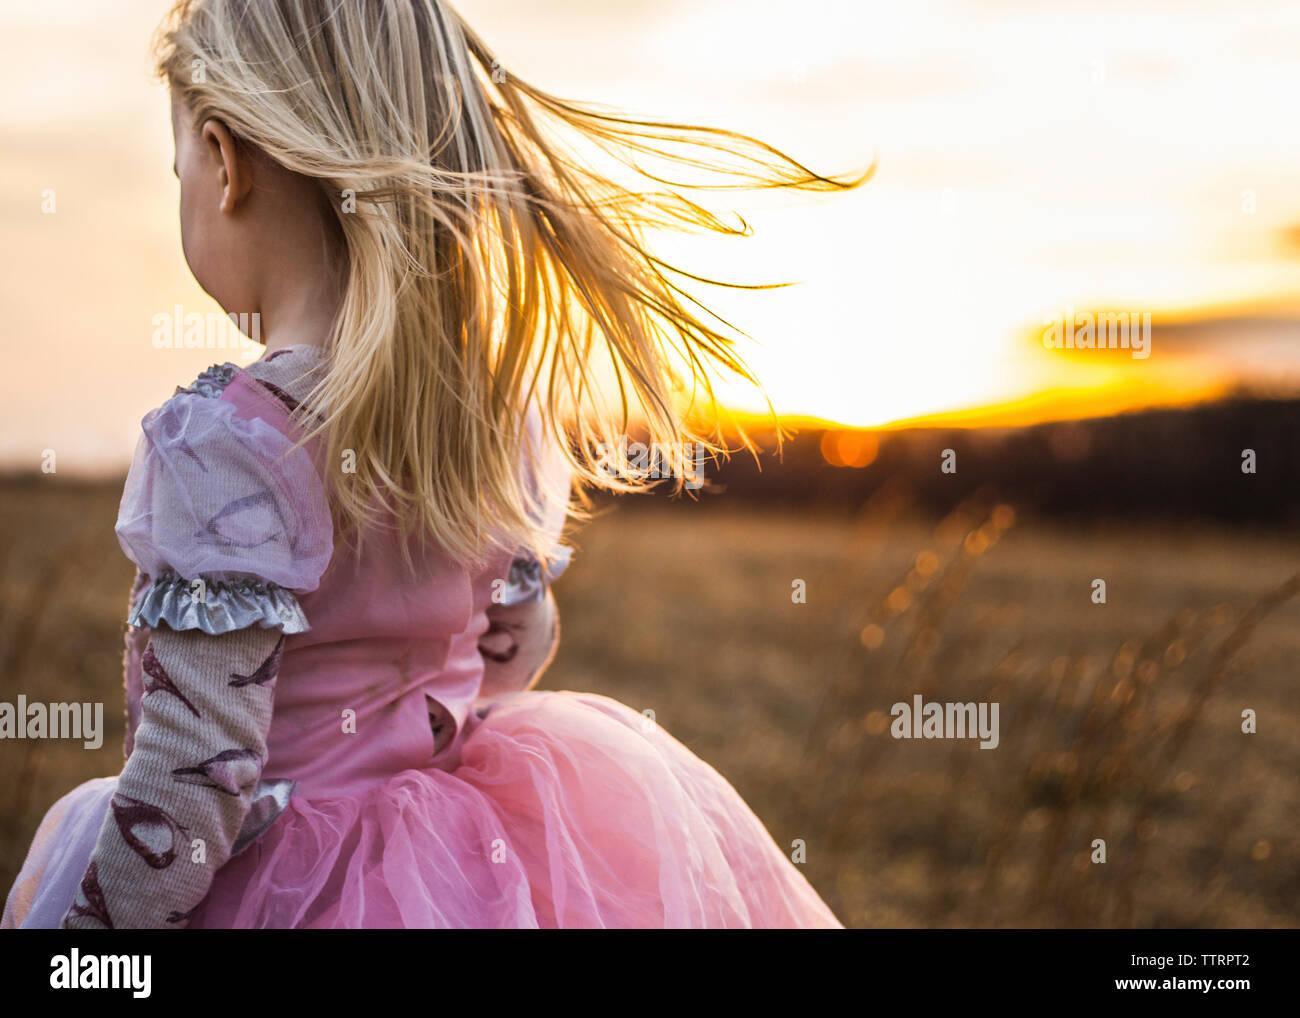 Girl walking on field against sky during sunset - Stock Image